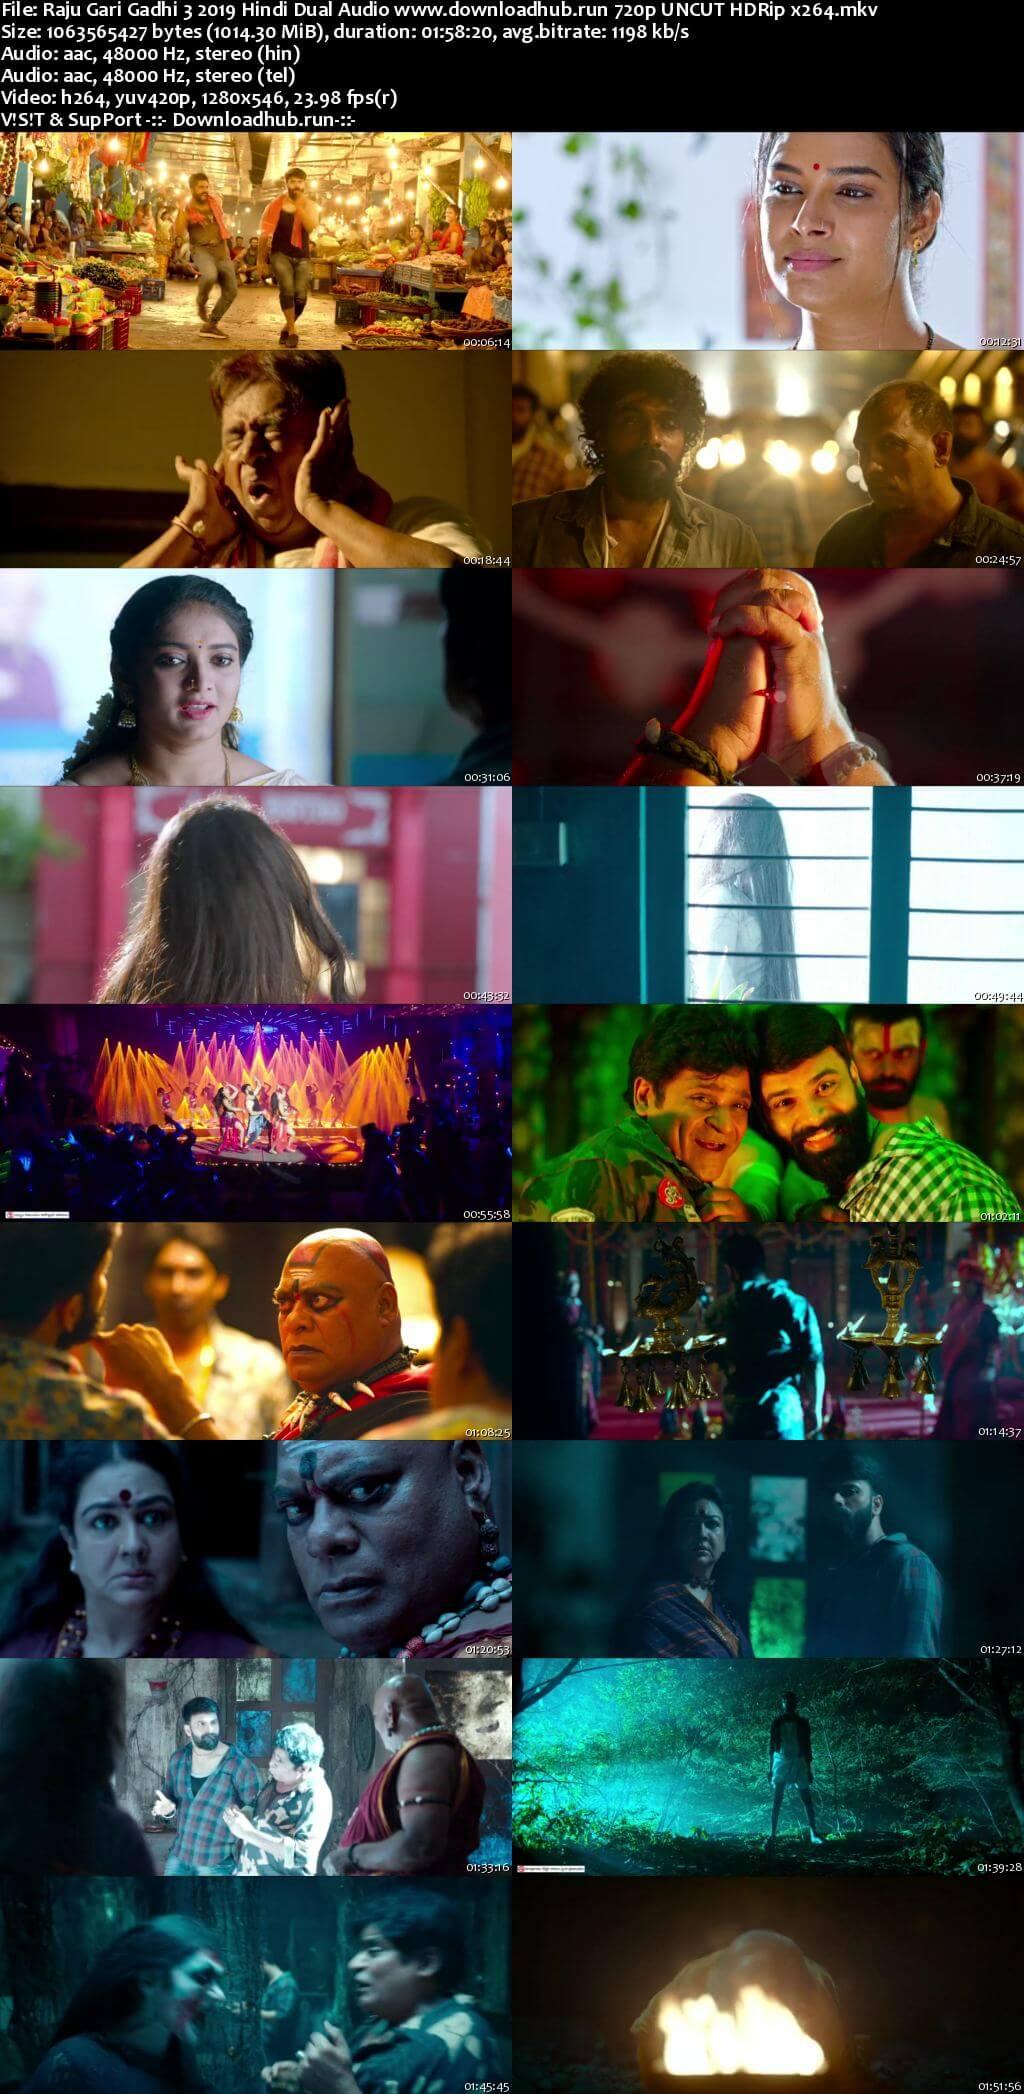 Raju Gari Gadhi 3 2019 Hindi Dual Audio 720p UNCUT HDRip x264